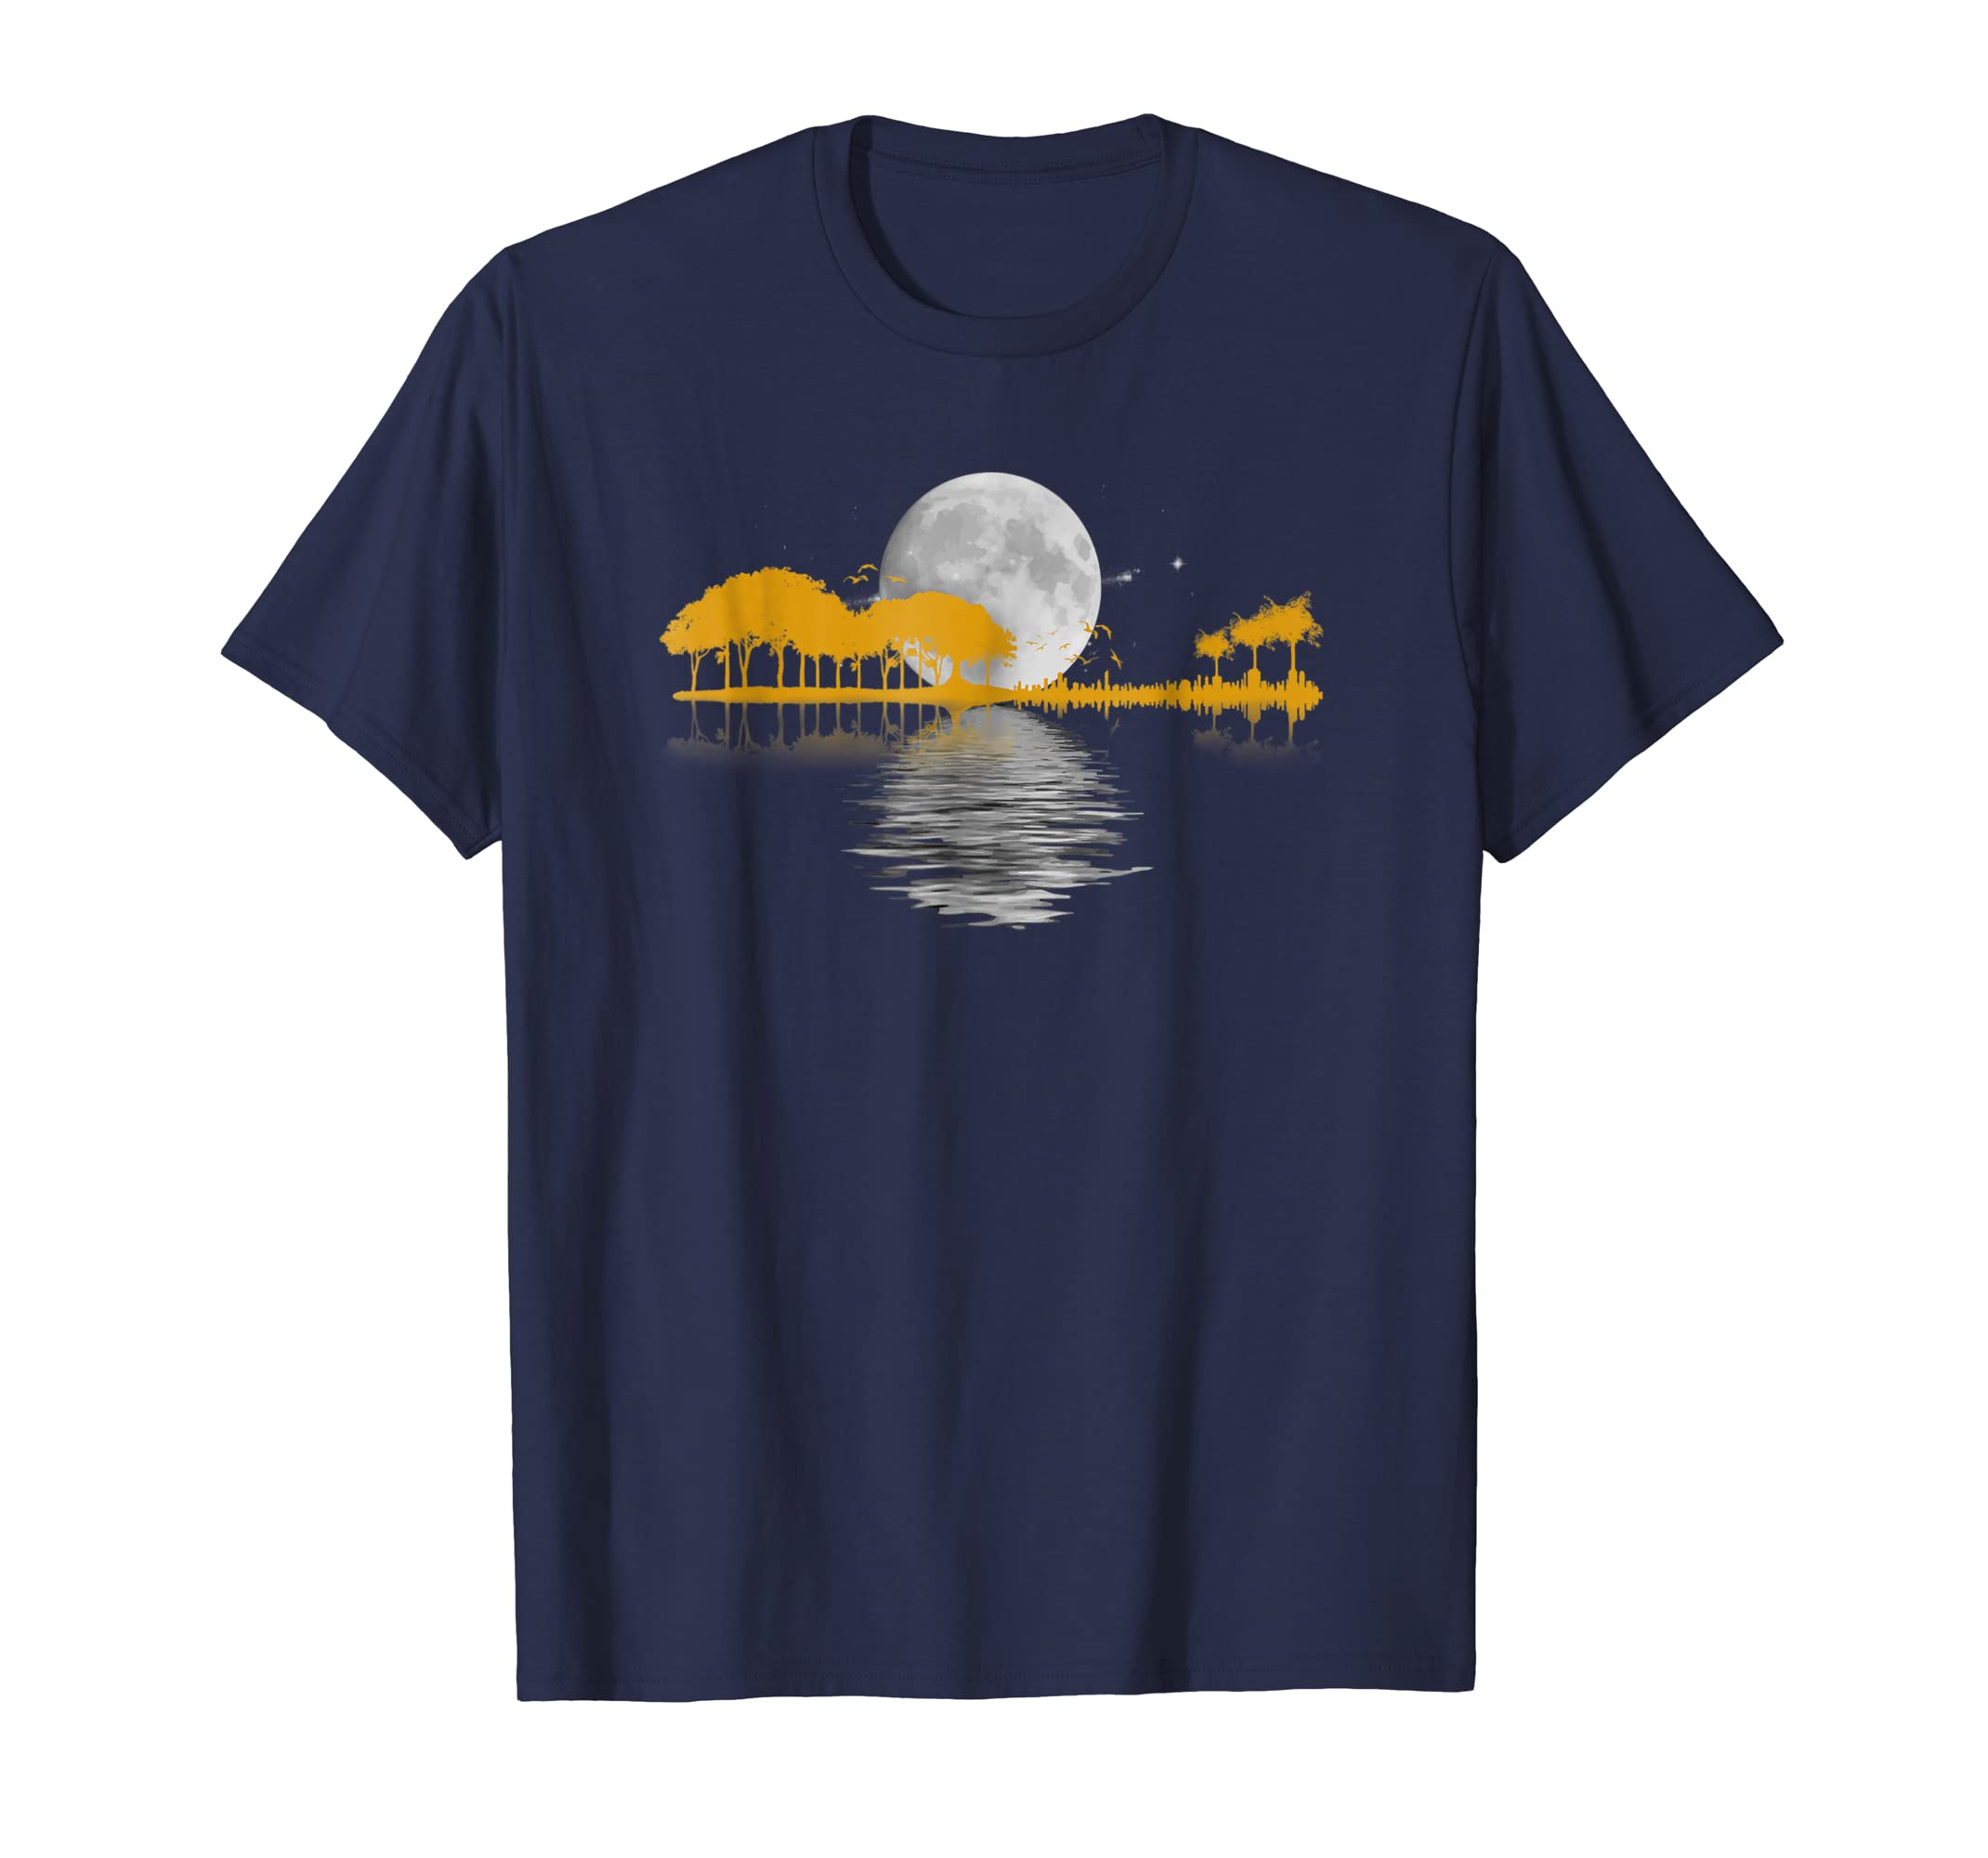 Guitar T Shirt. Retro Nature Shirt, Vintage Gift For Men-azvn